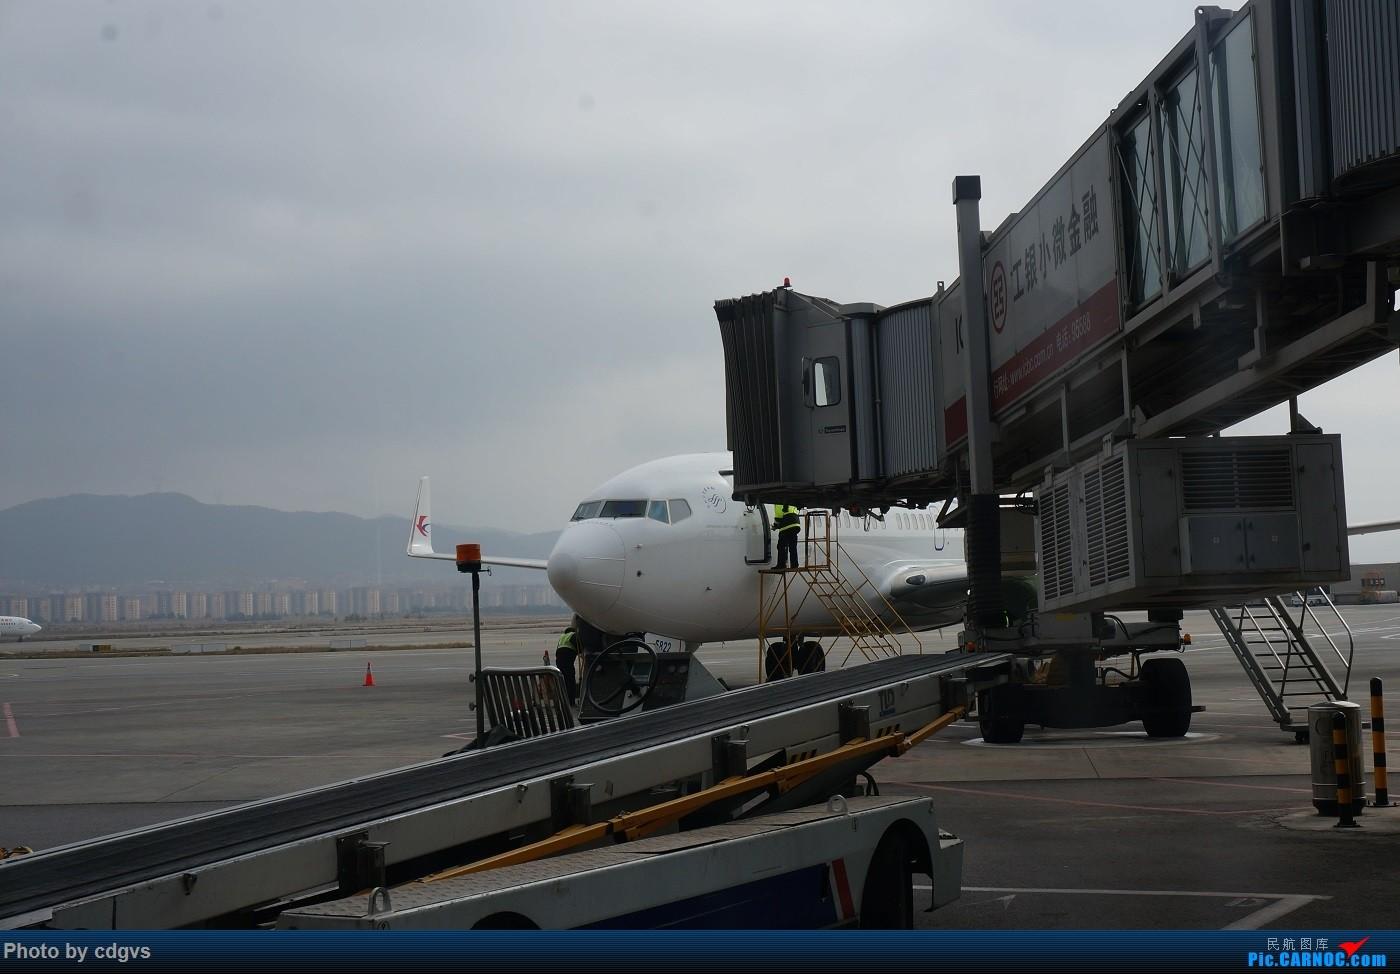 Re:[原创]KMG-LJG-KMG 东航&南航 省内刷航段,飞空客波音两种不同机型 BOEING 737-700 B-5822 中国昆明长水国际机场